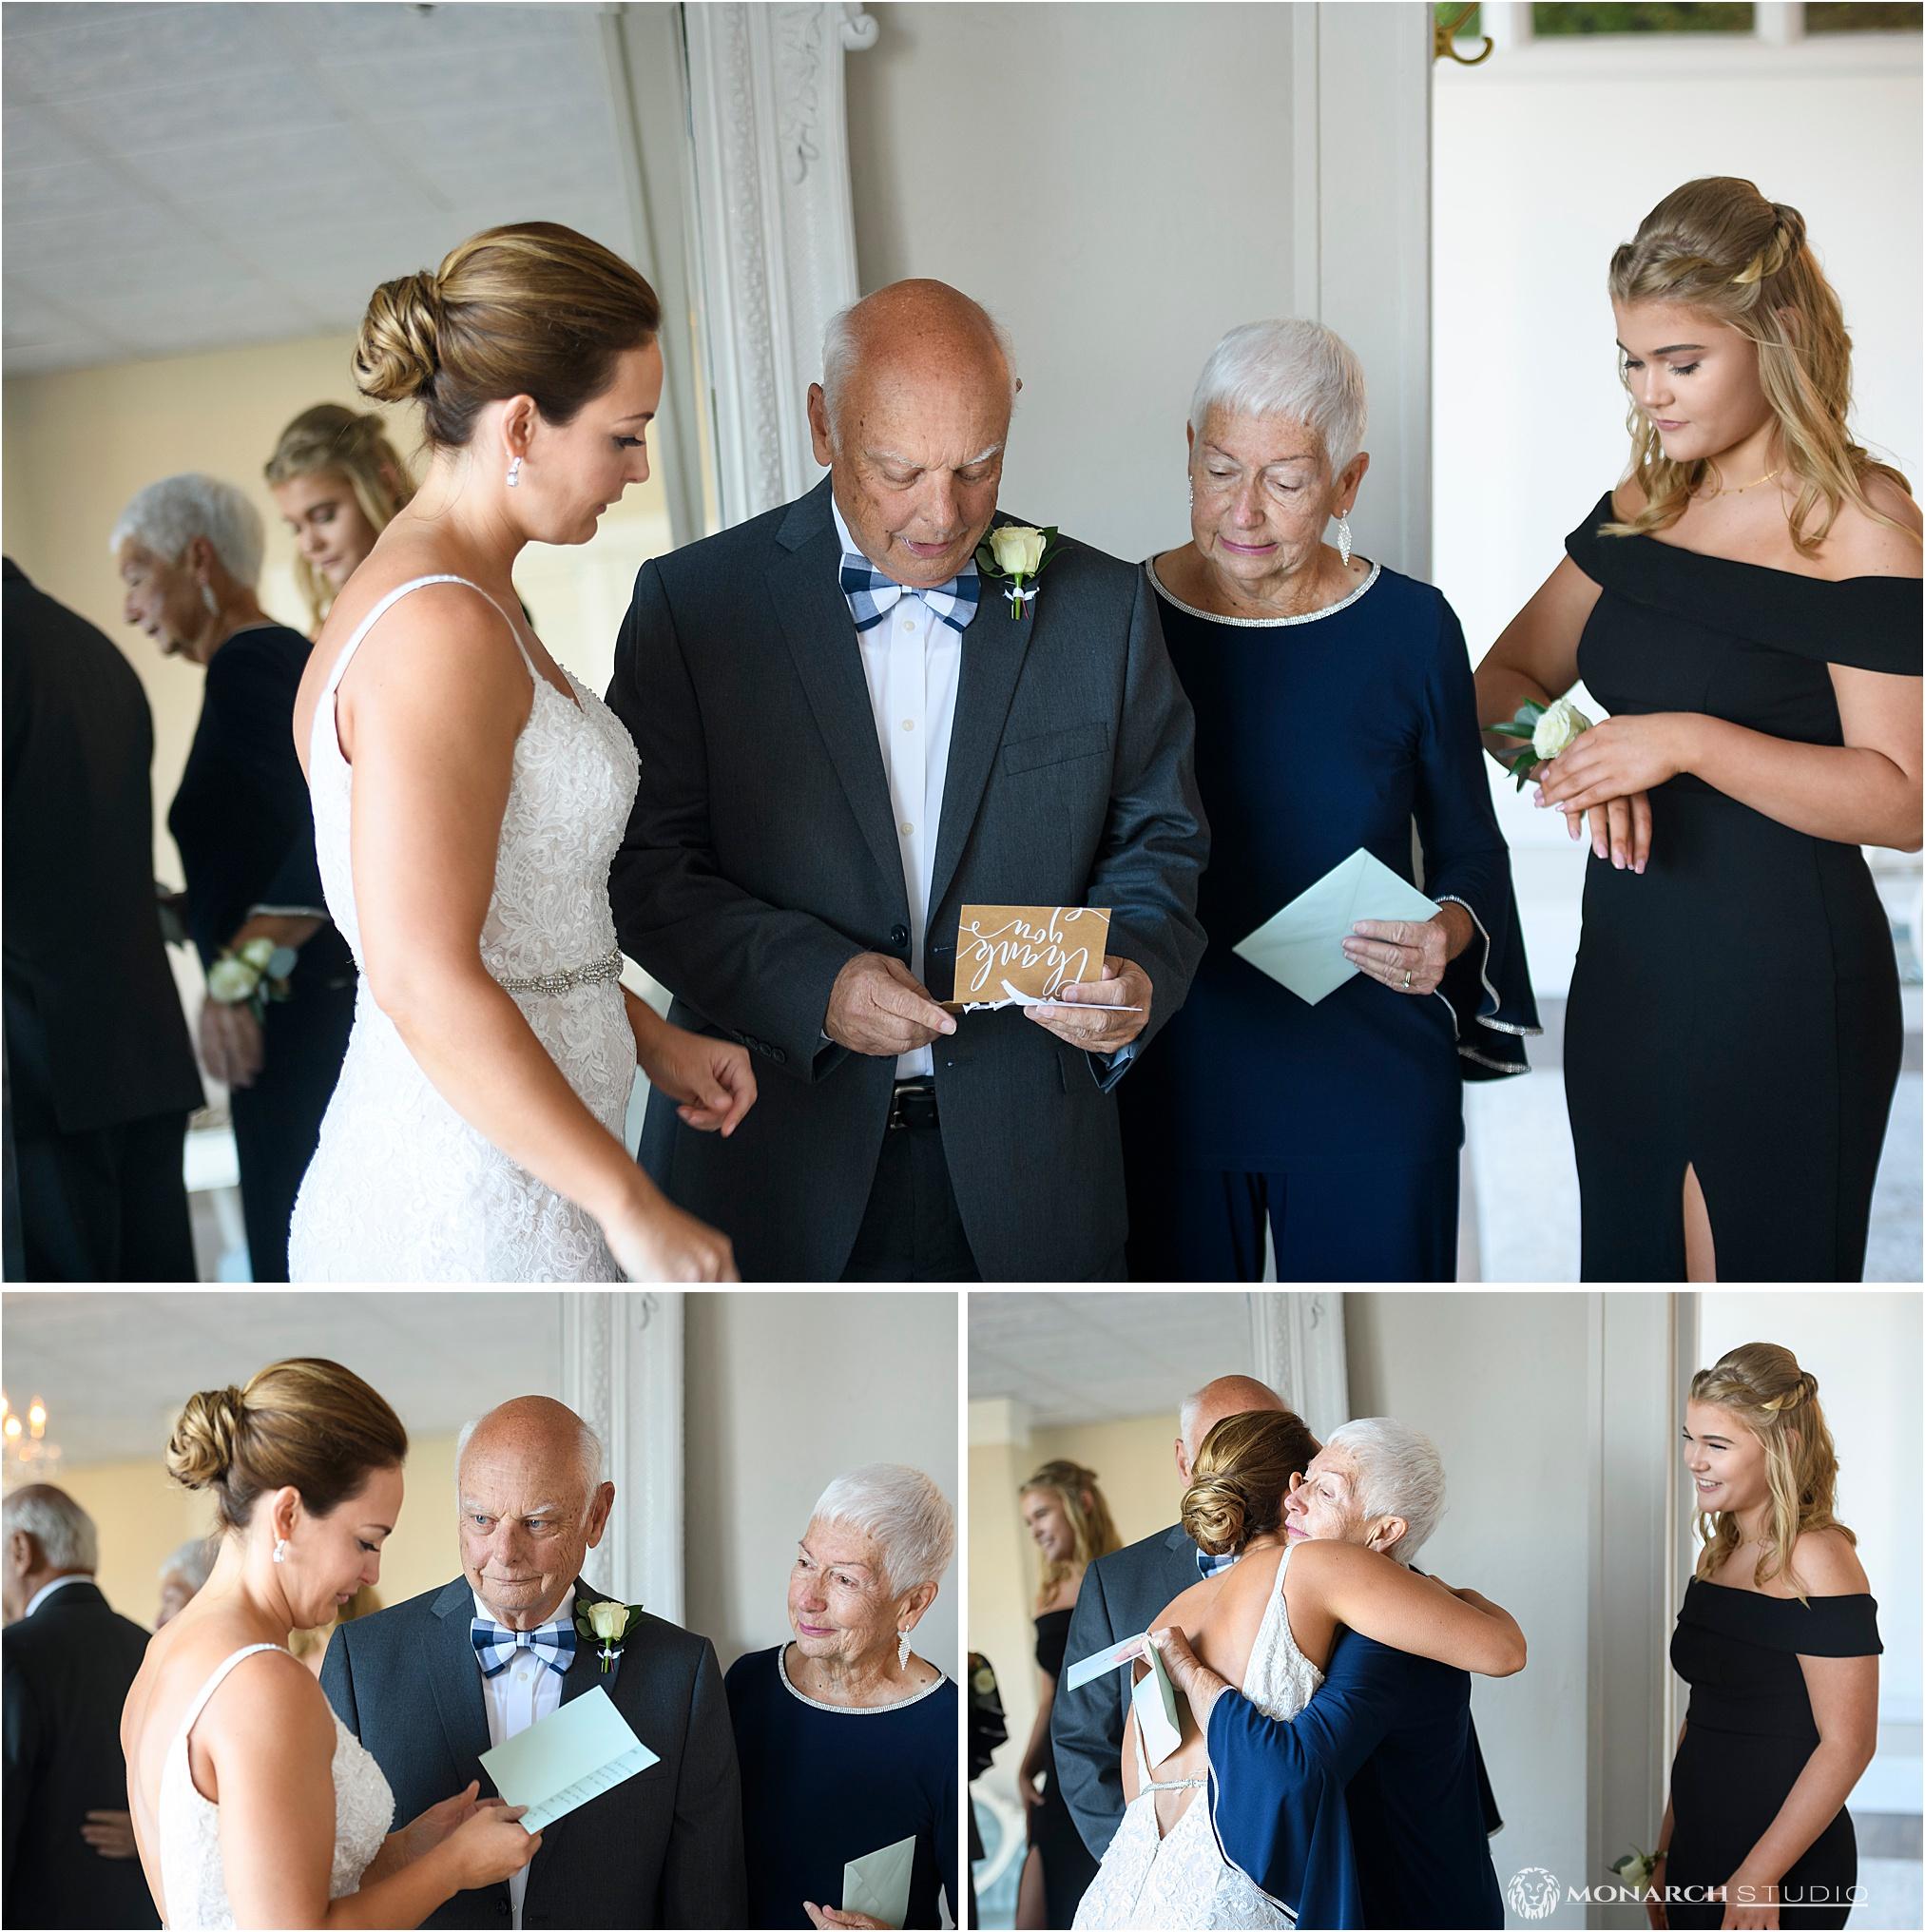 056-whiteroom-wedding-photographer-2019-05-22_0038.jpg